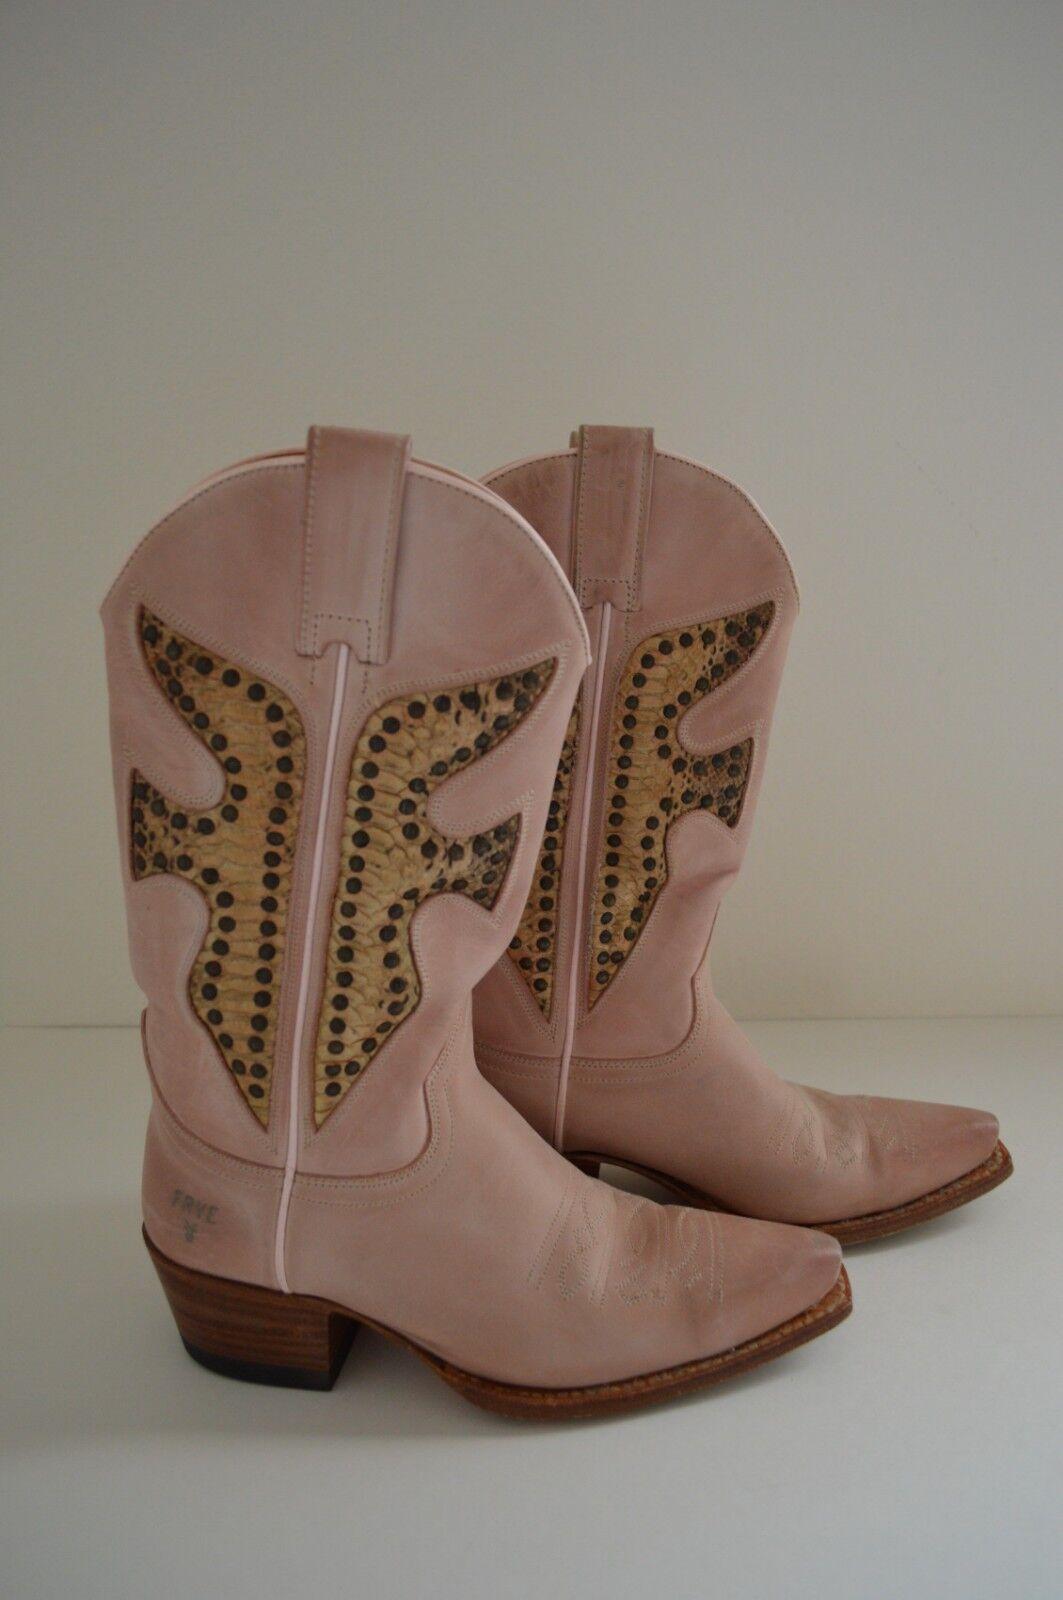 5. 5.5 FRYE Daisy Duke PINK Tan Python Snake Inlay Stud Leder Cowboy Stiefel